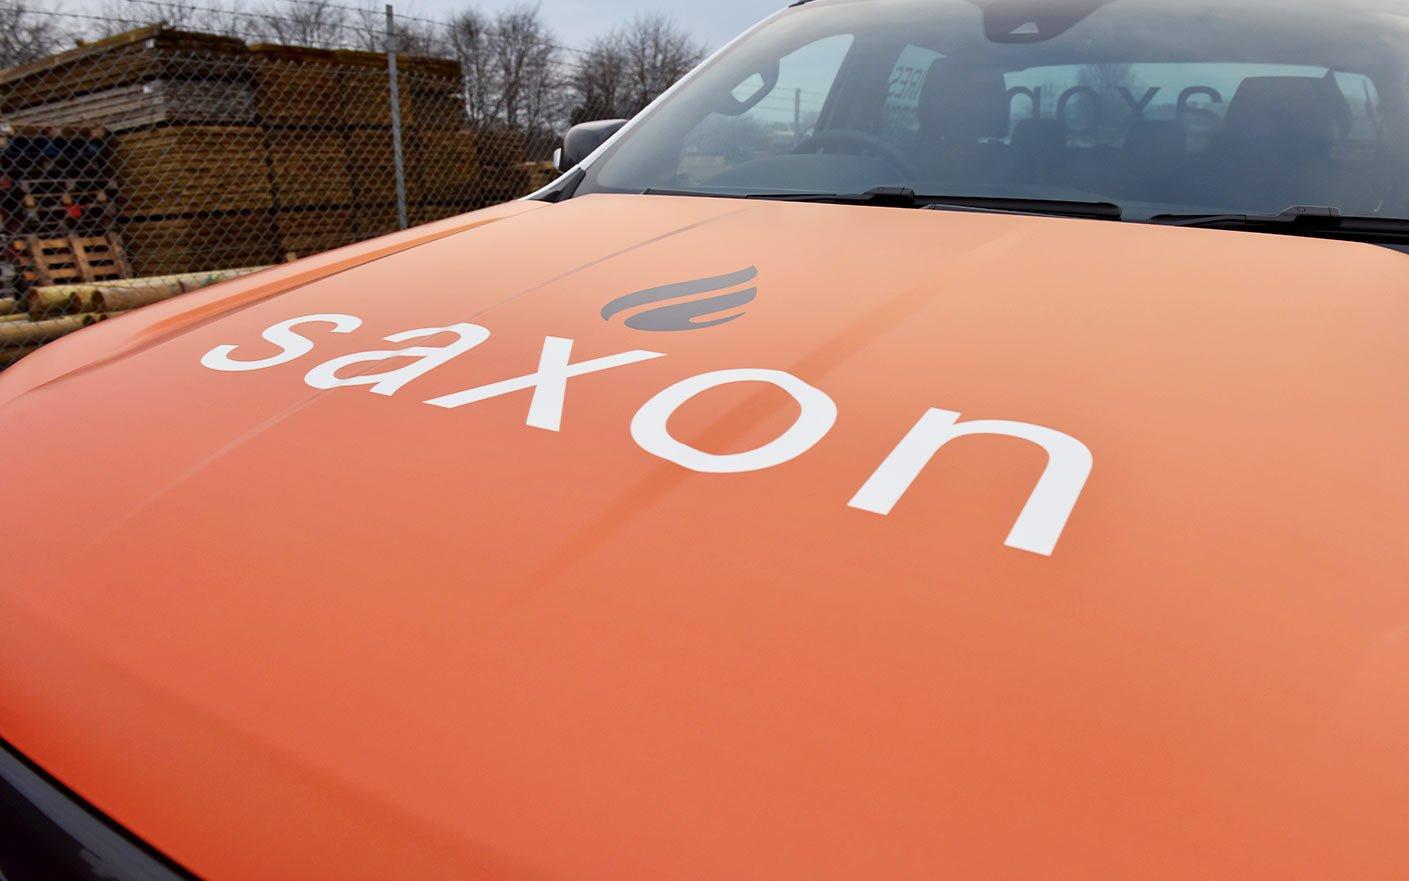 Saxon Heating Vehicle Livery